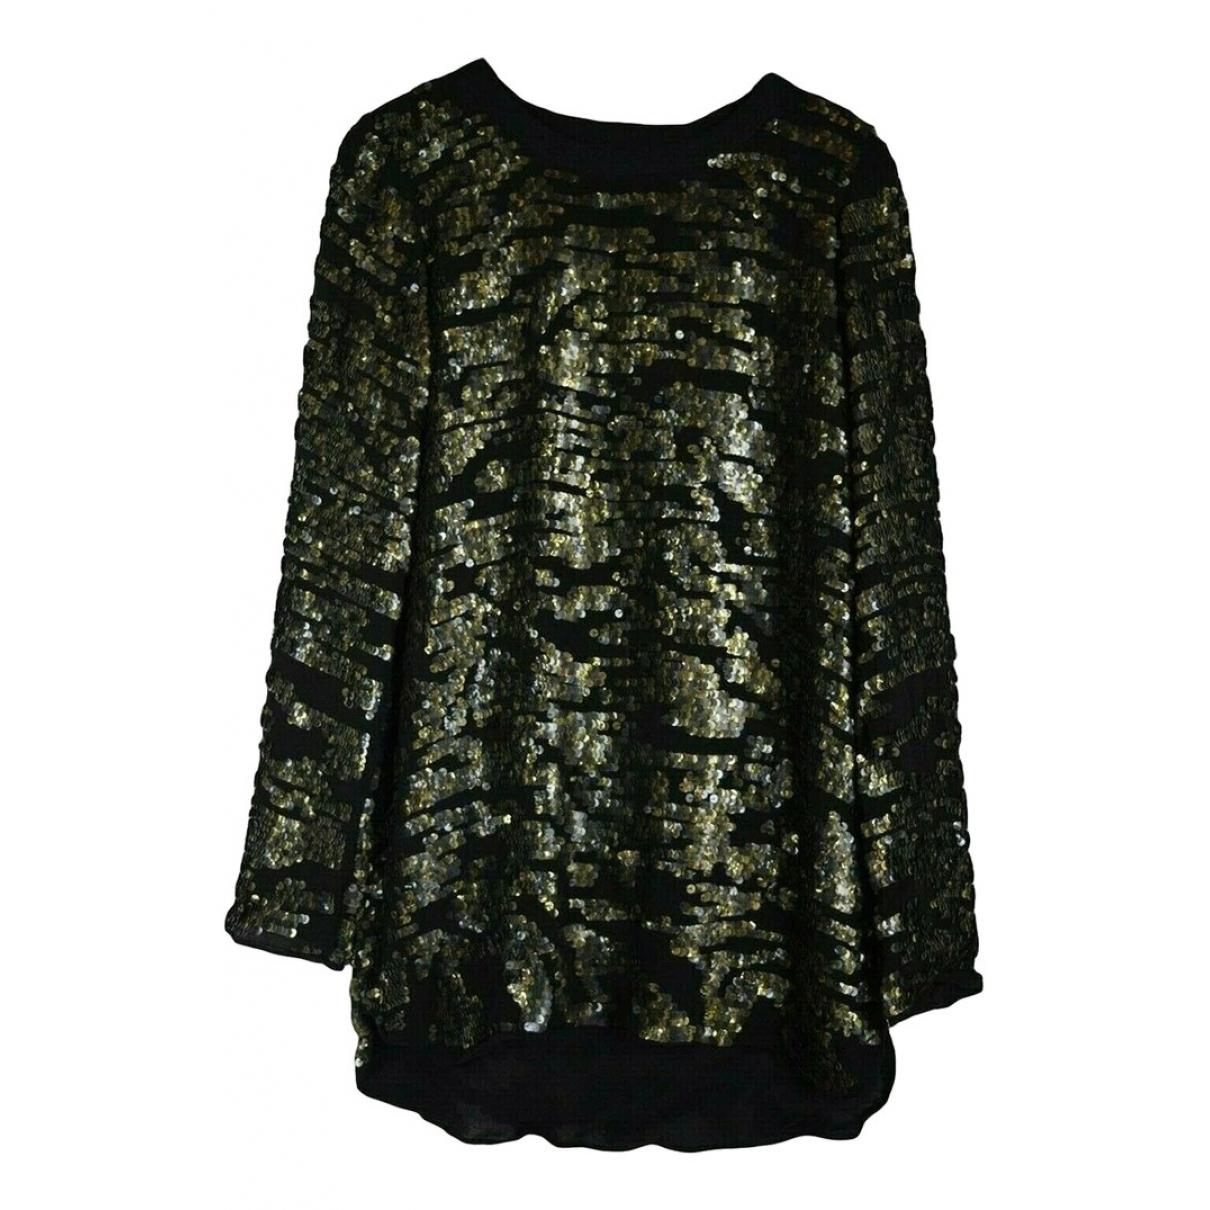 Isabel Marant \N Black dress for Women XS International